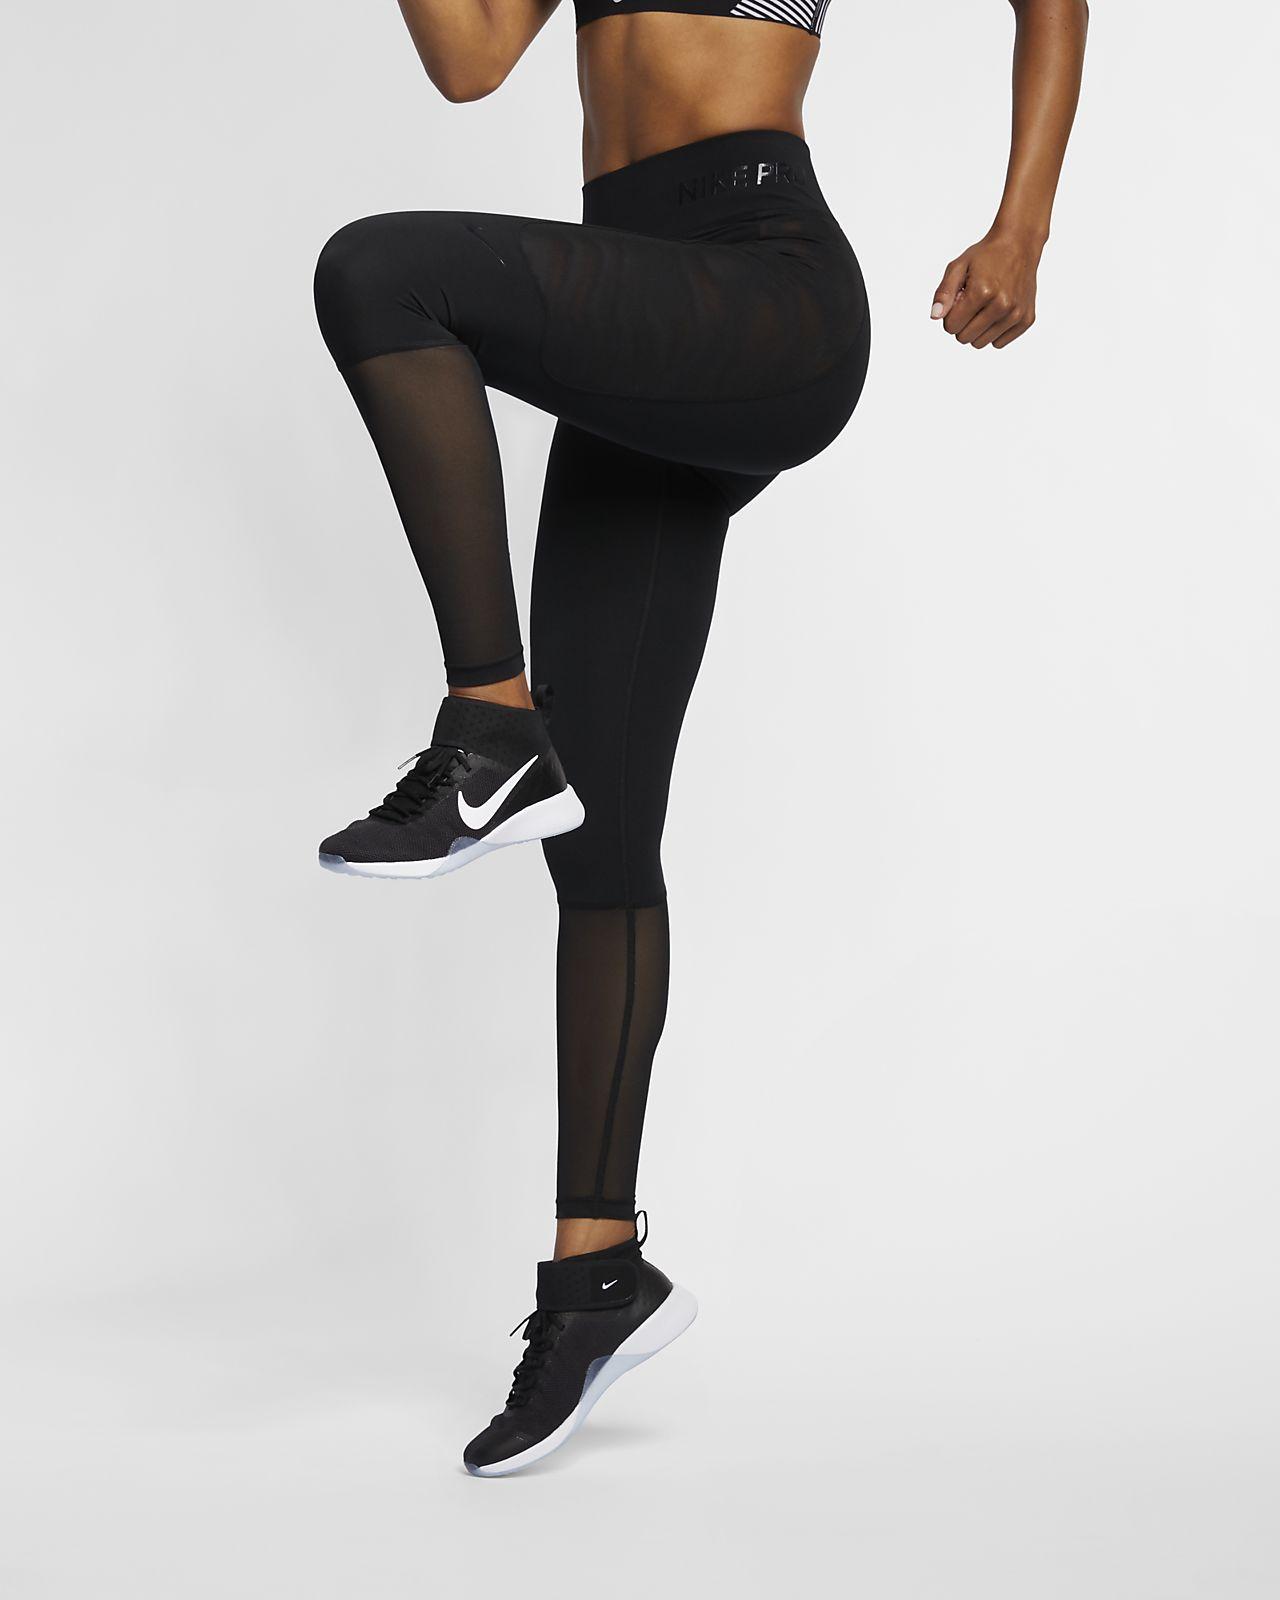 Calzamaglia Sportiva da Uomo Nike PRO Hypercool Compression